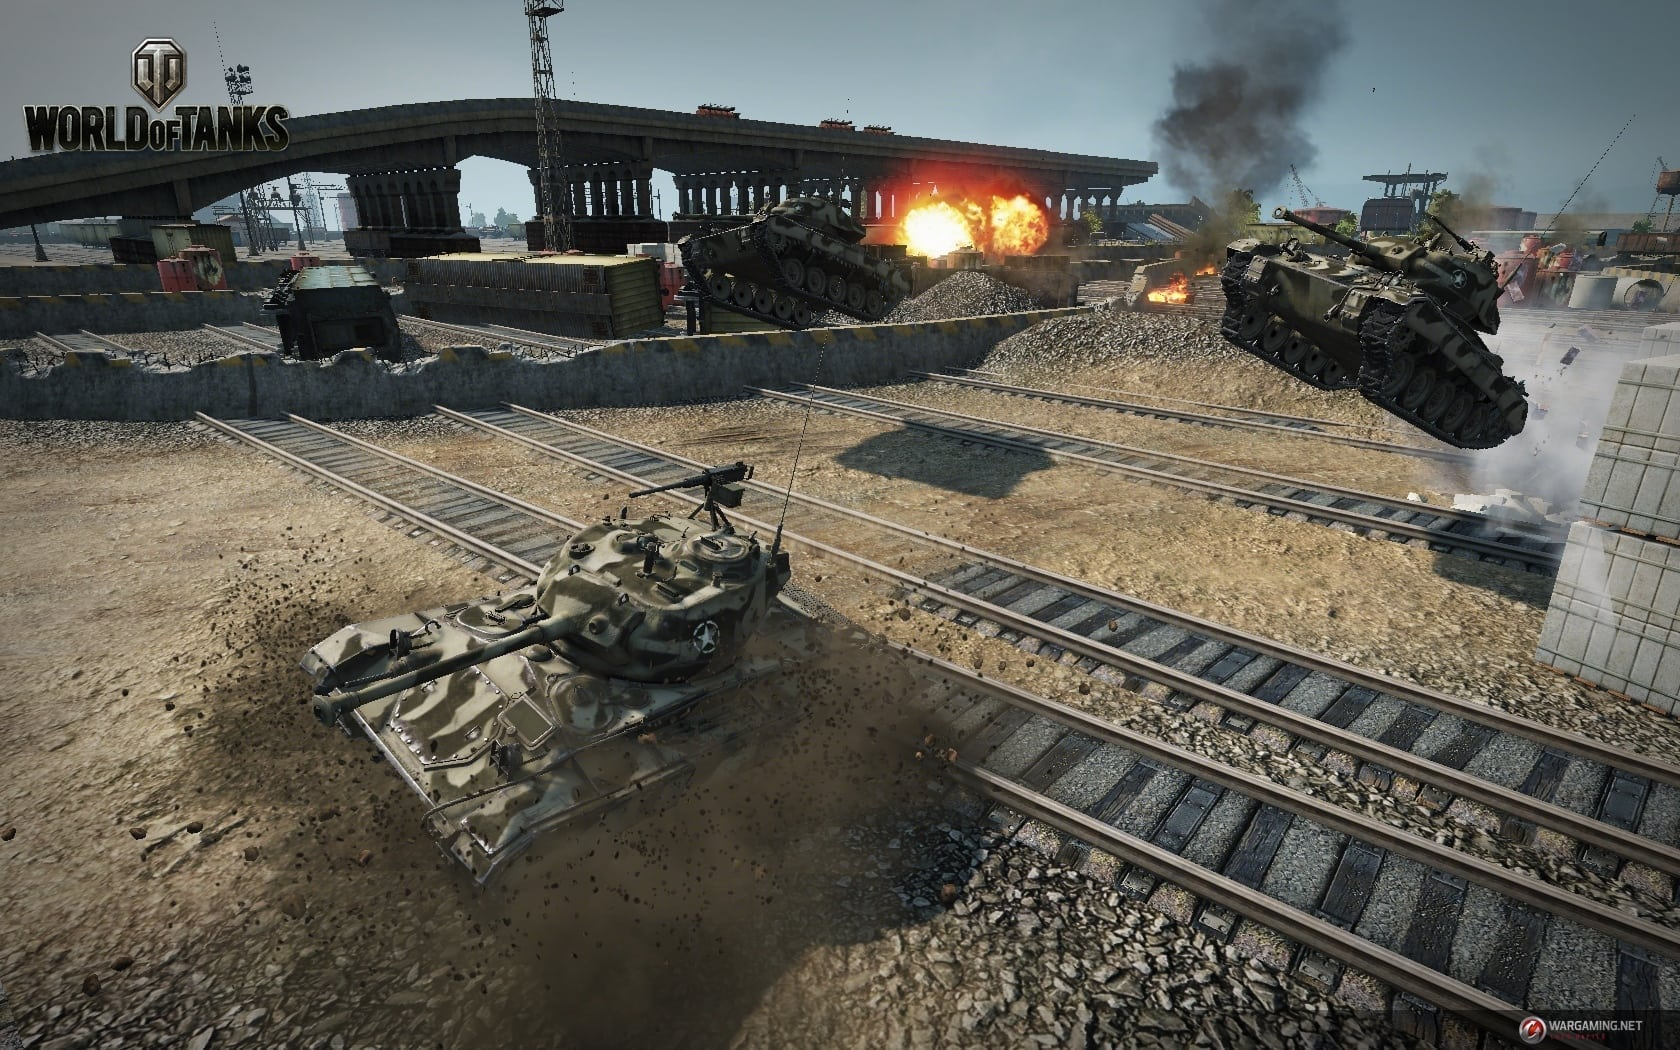 World of Tanks - Tank Rally mode screenshot 2